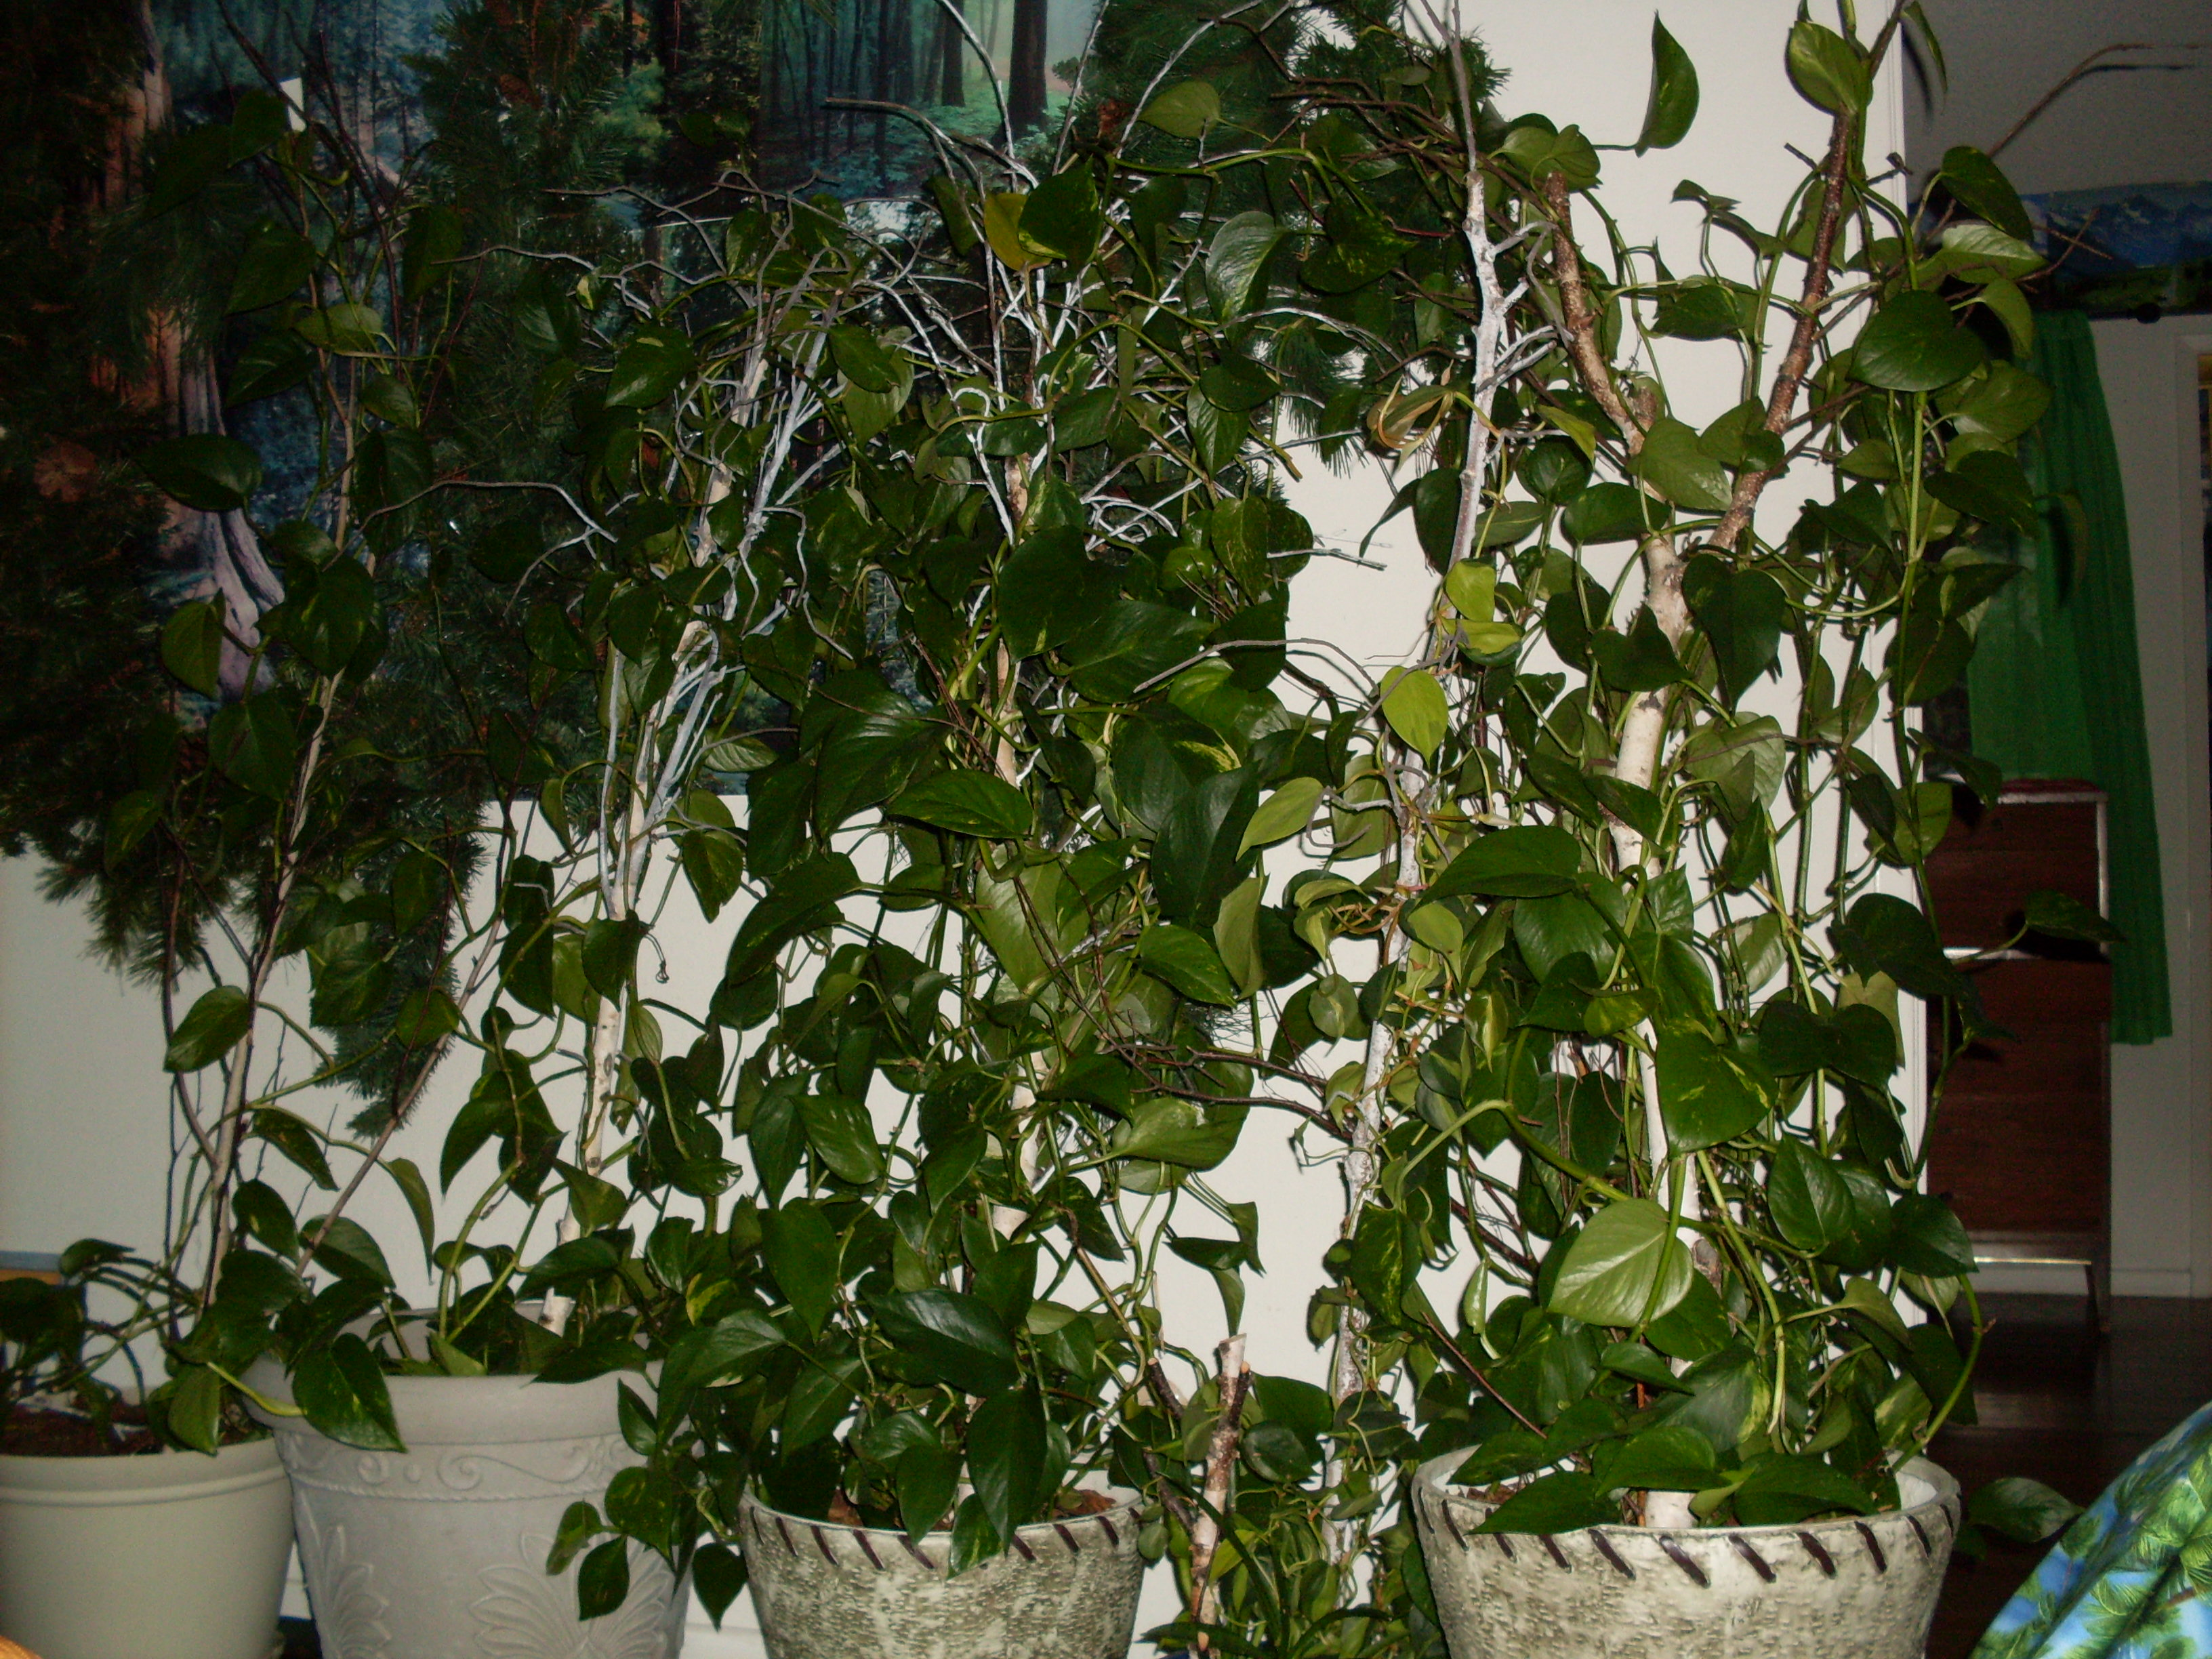 making oxygen dr renfrews birch trees in family room 3264x2448